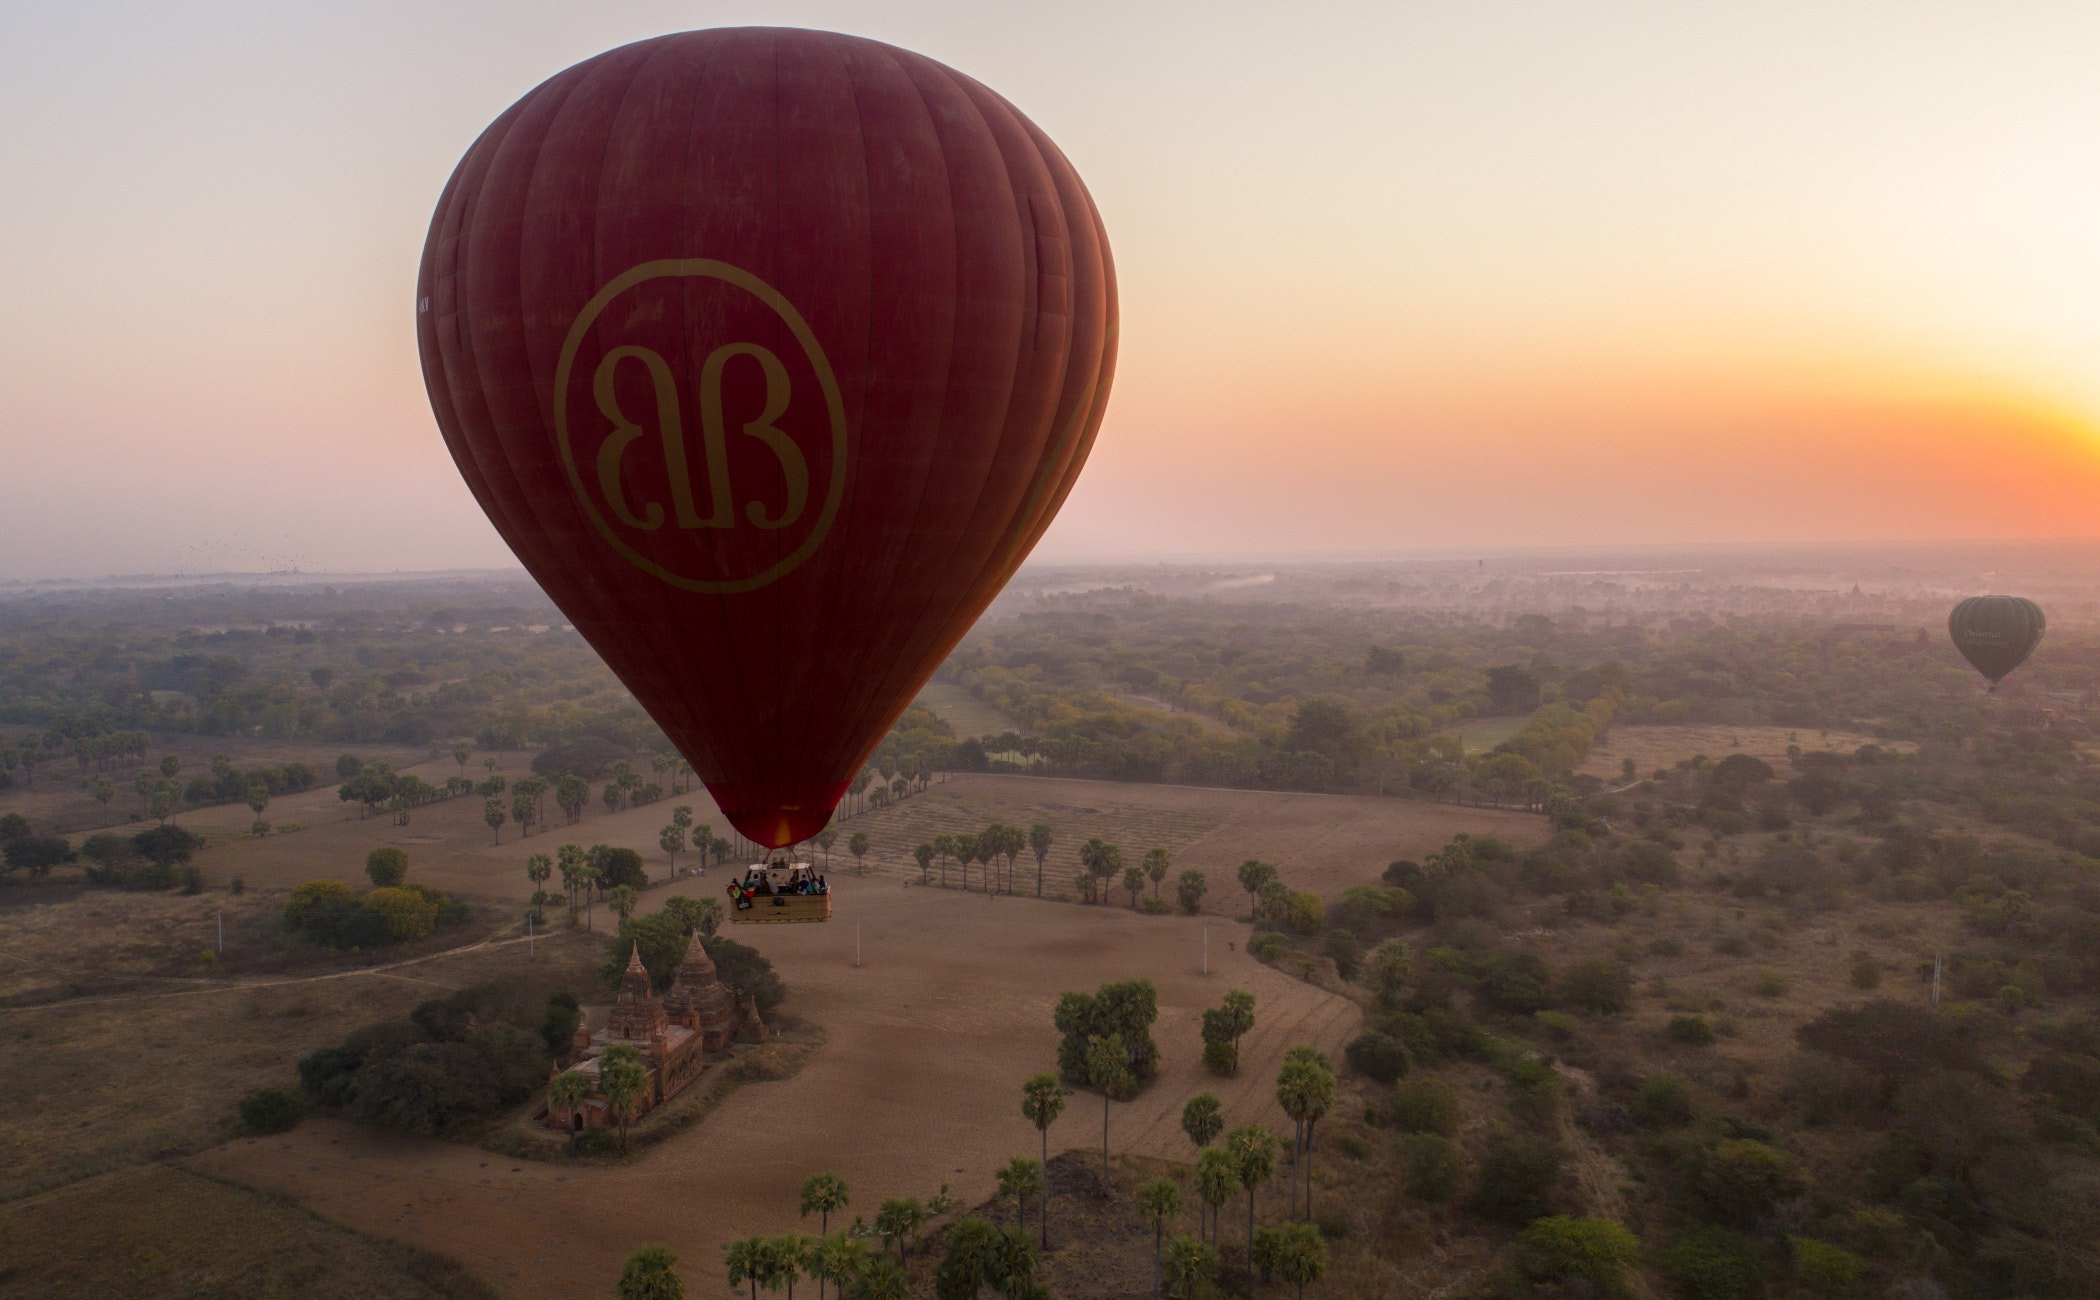 ball,balloon,transportation,aircraft,hot air balloon,vehicle